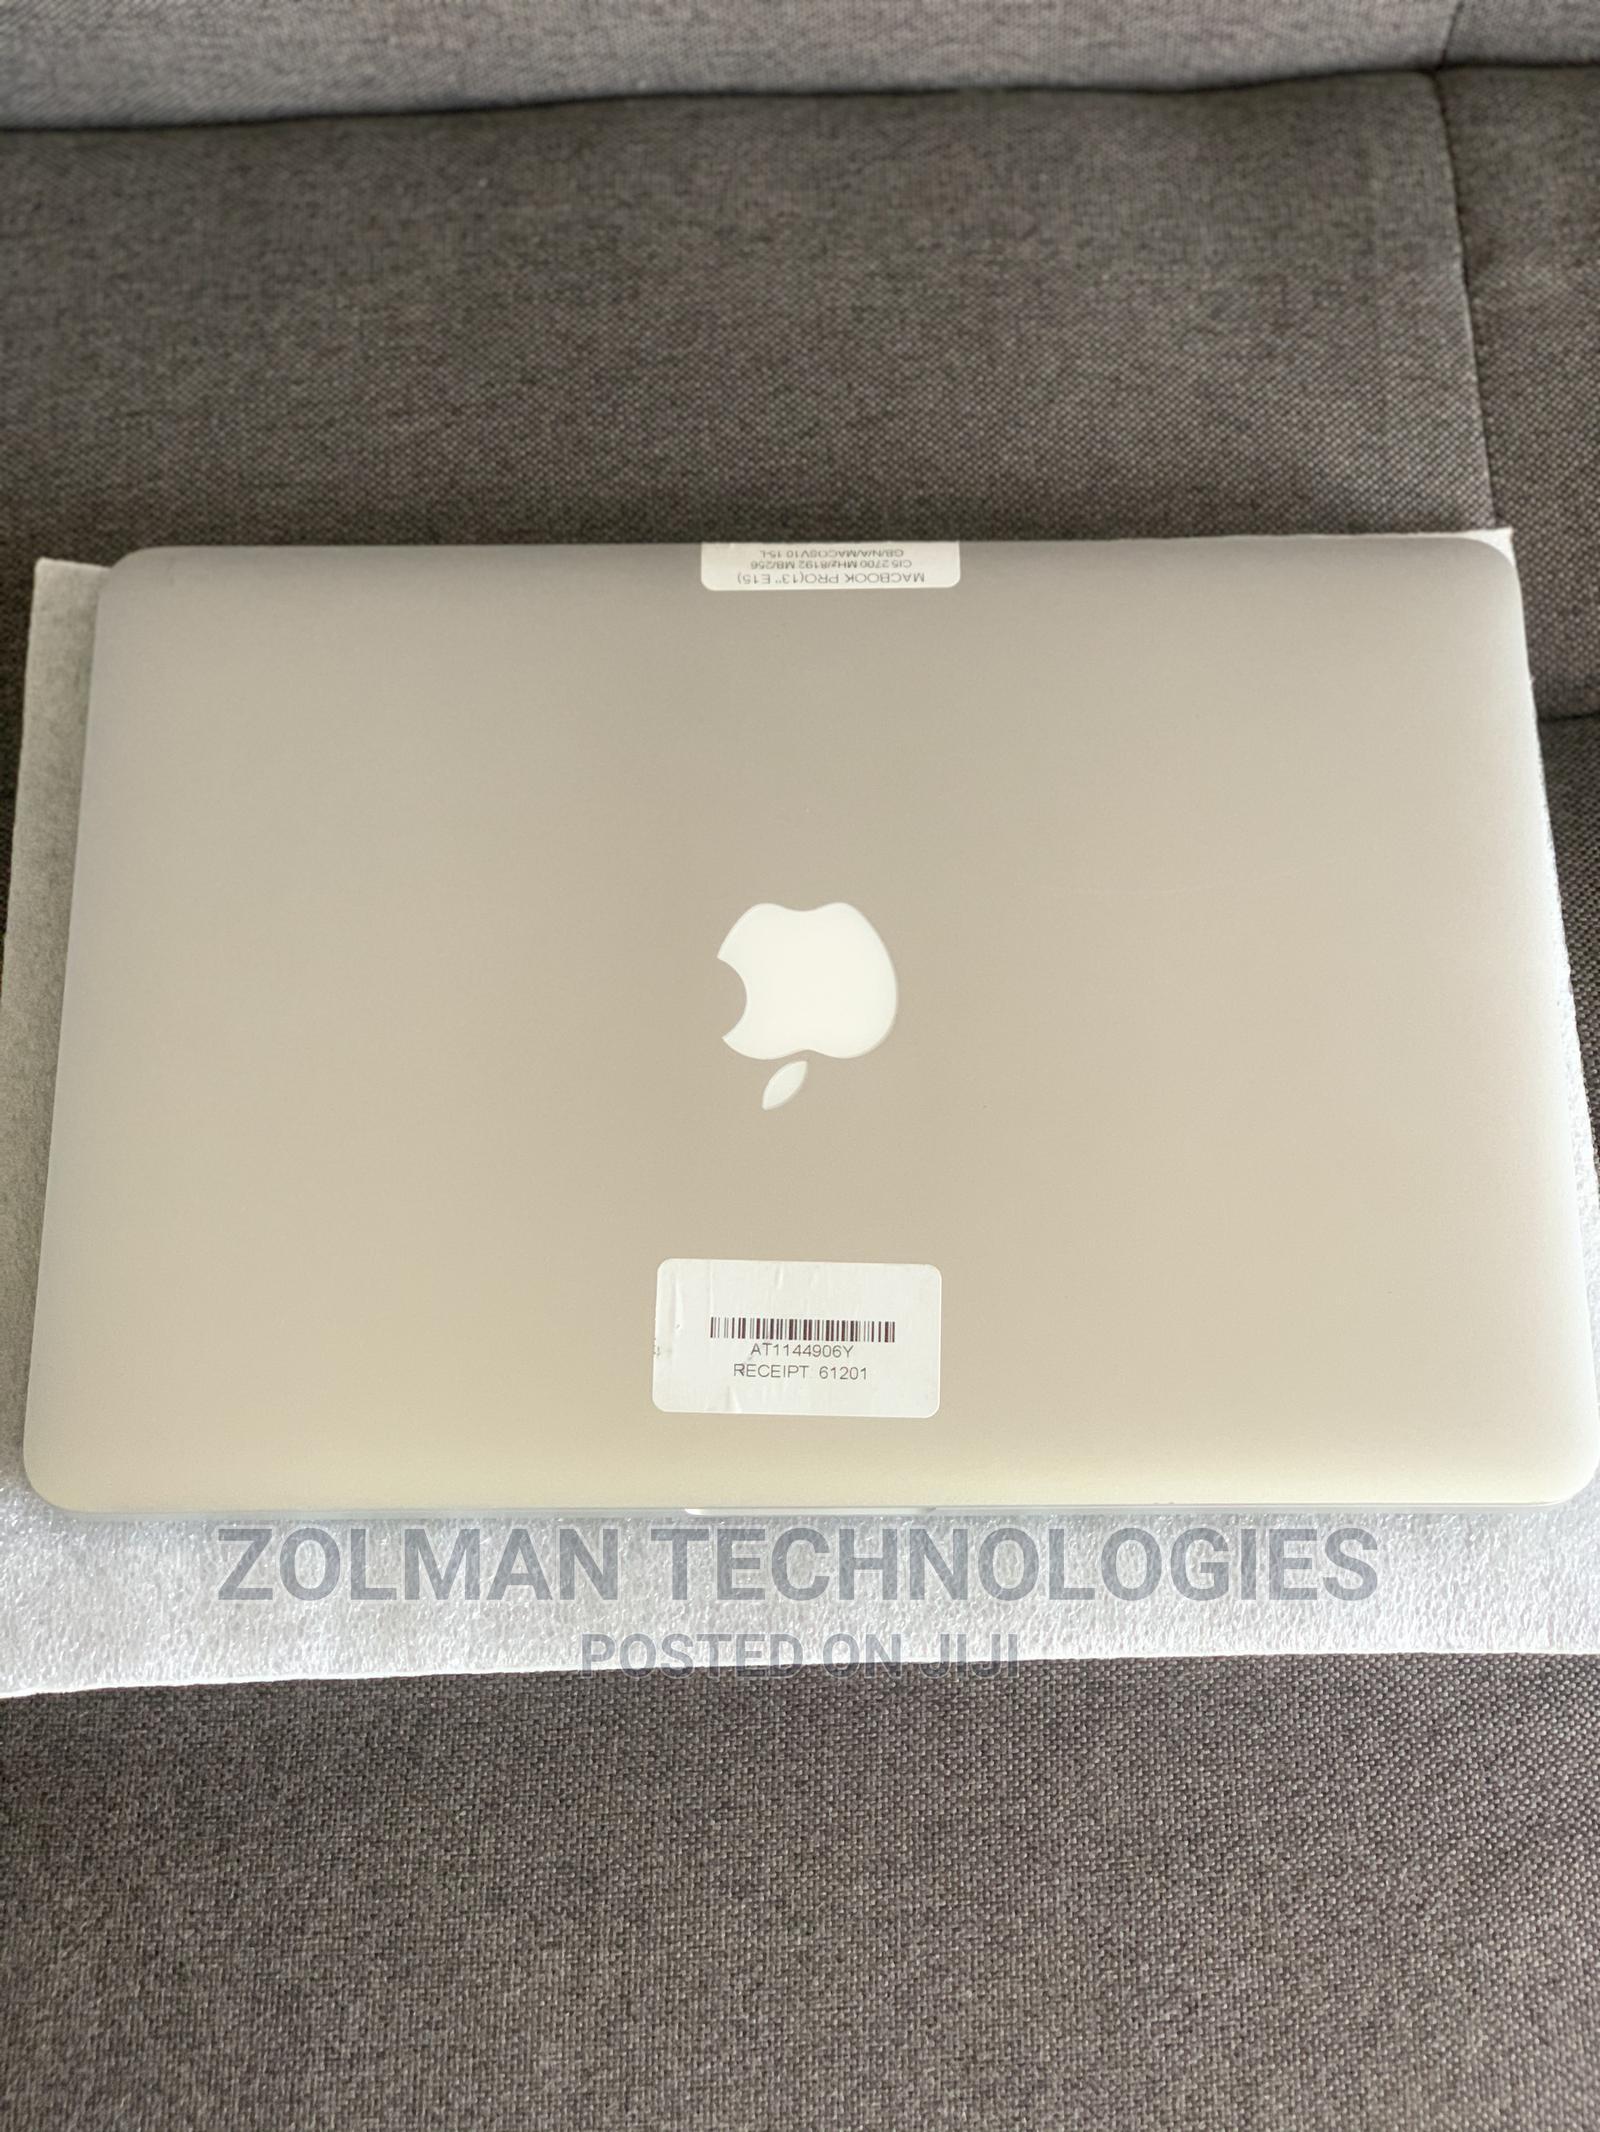 Laptop Apple MacBook 2015 8GB Intel Core I5 SSD 256GB   Laptops & Computers for sale in Ilorin West, Kwara State, Nigeria